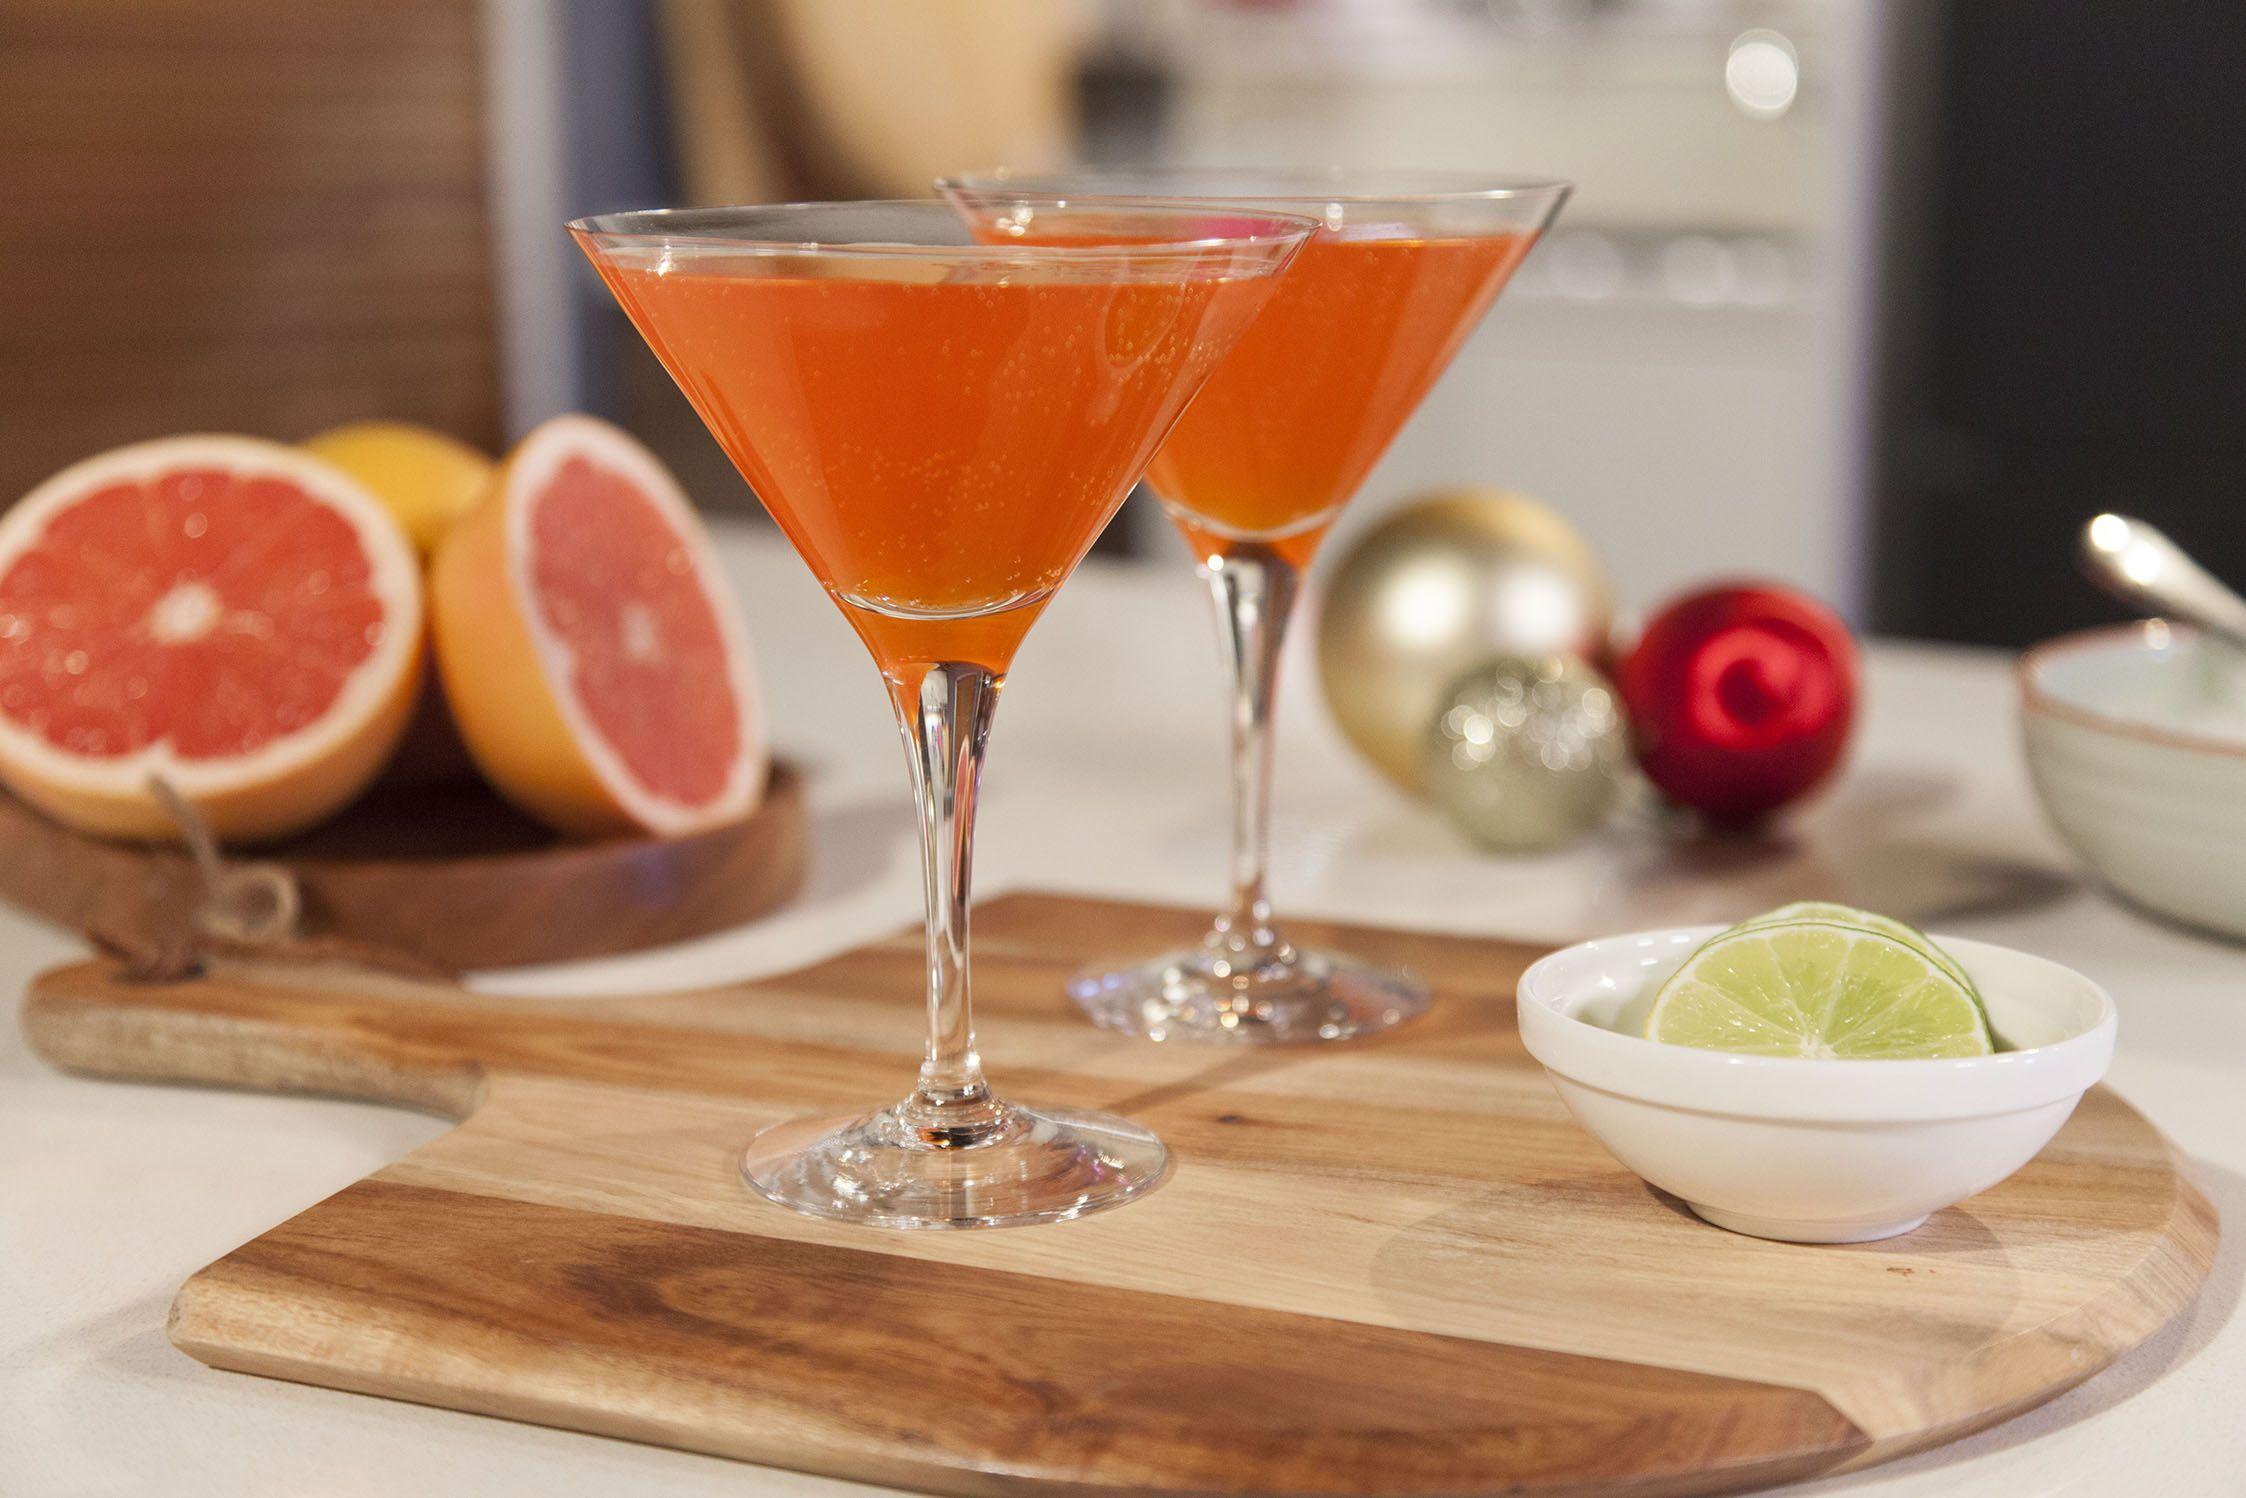 Aperol and Red Grapefruit Cocktail #grapefruitcocktail